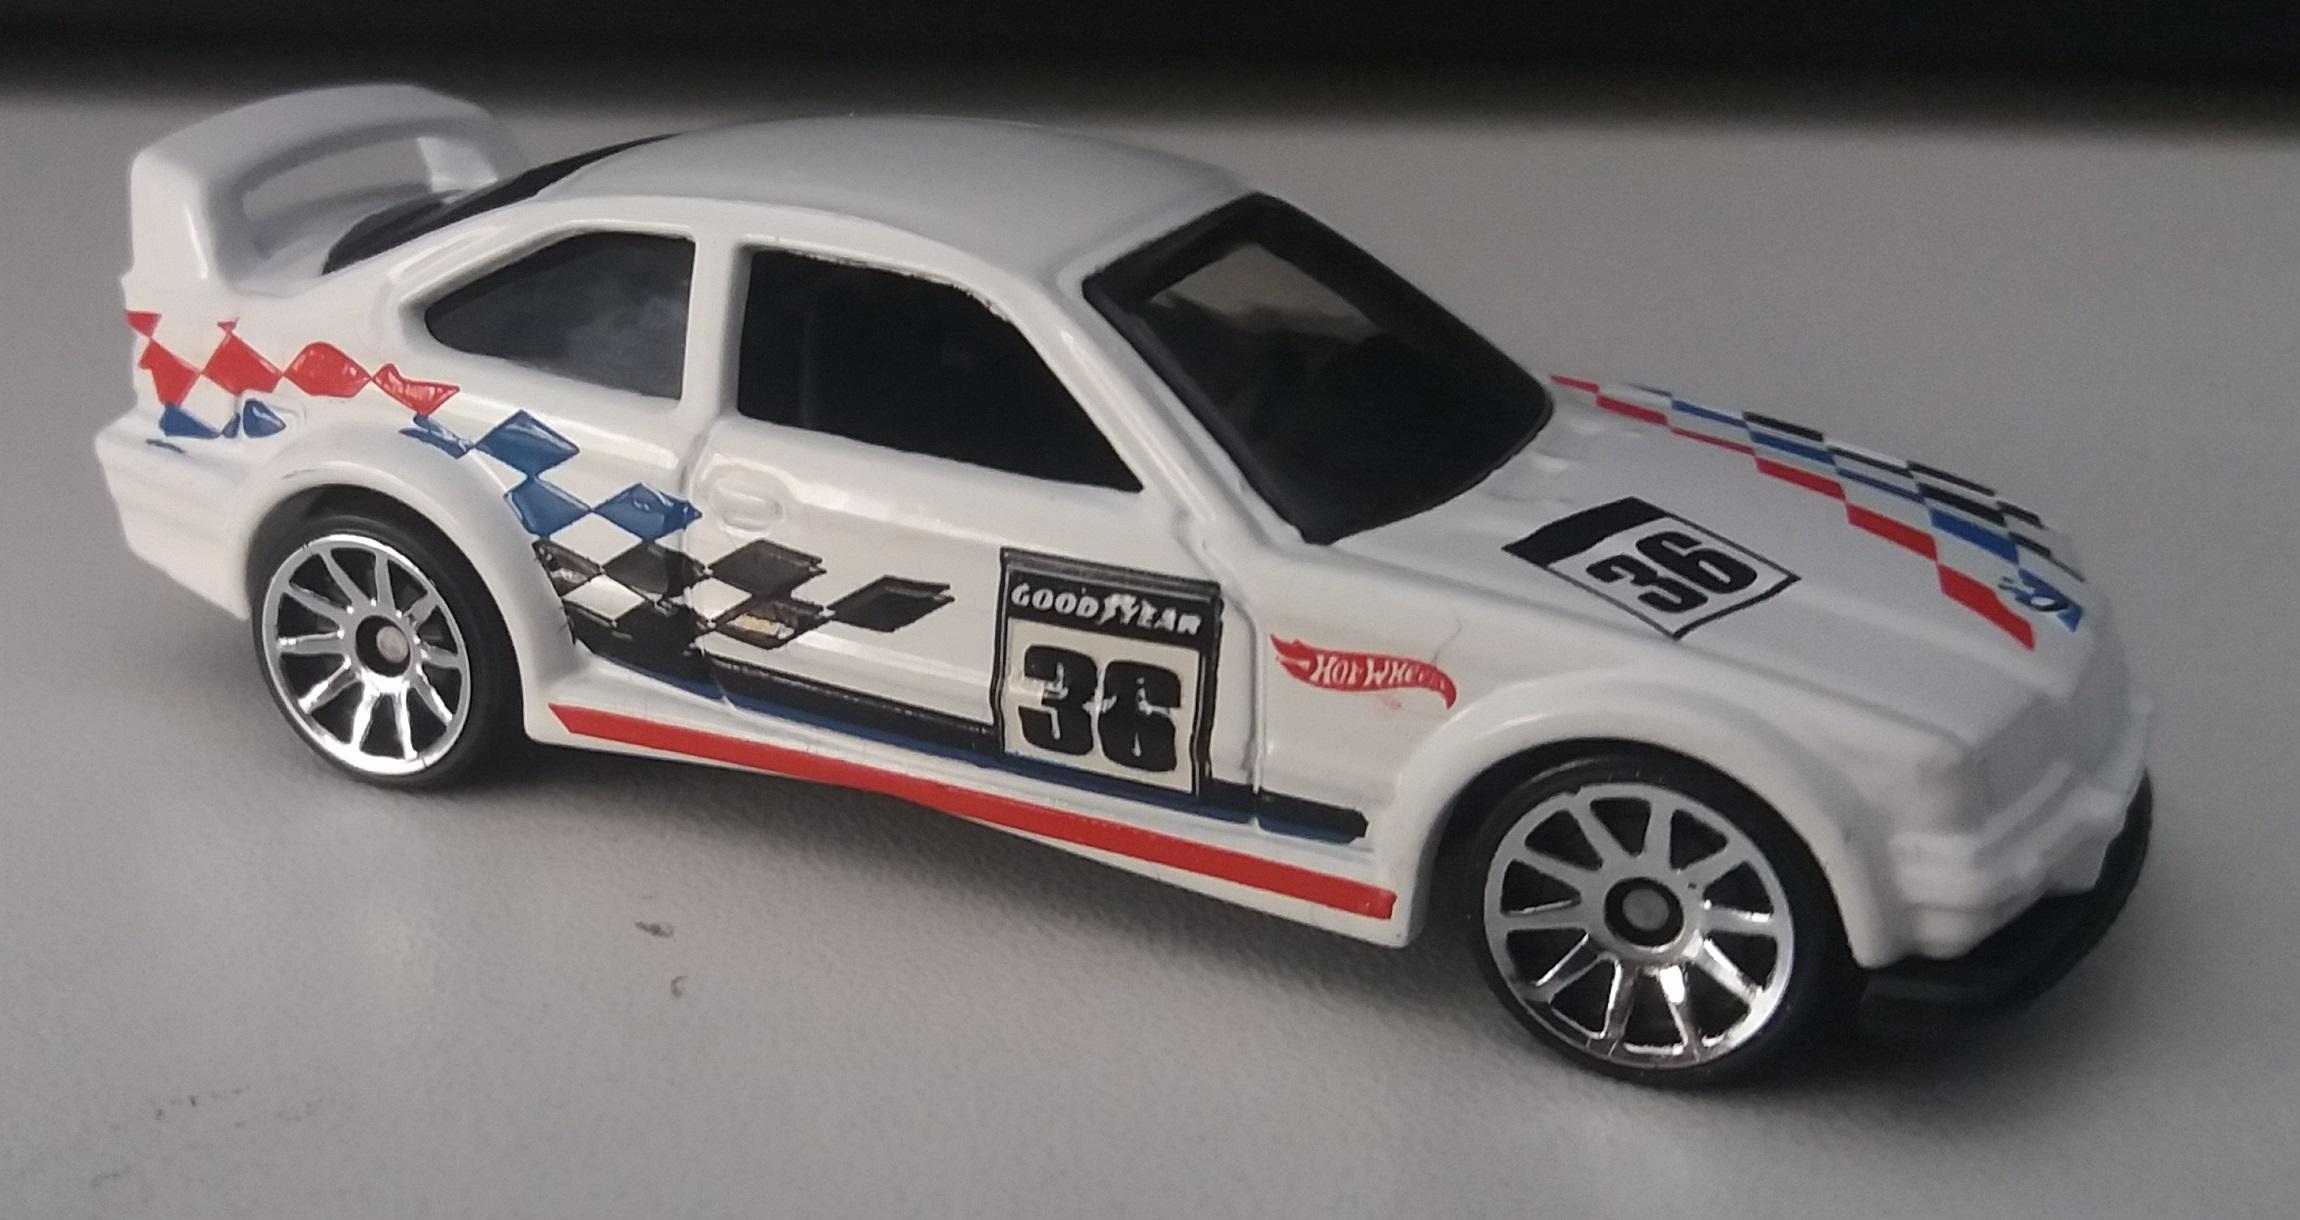 Bmw E36 M3 Race Hot Wheels Wiki Fandom Powered By Wikia